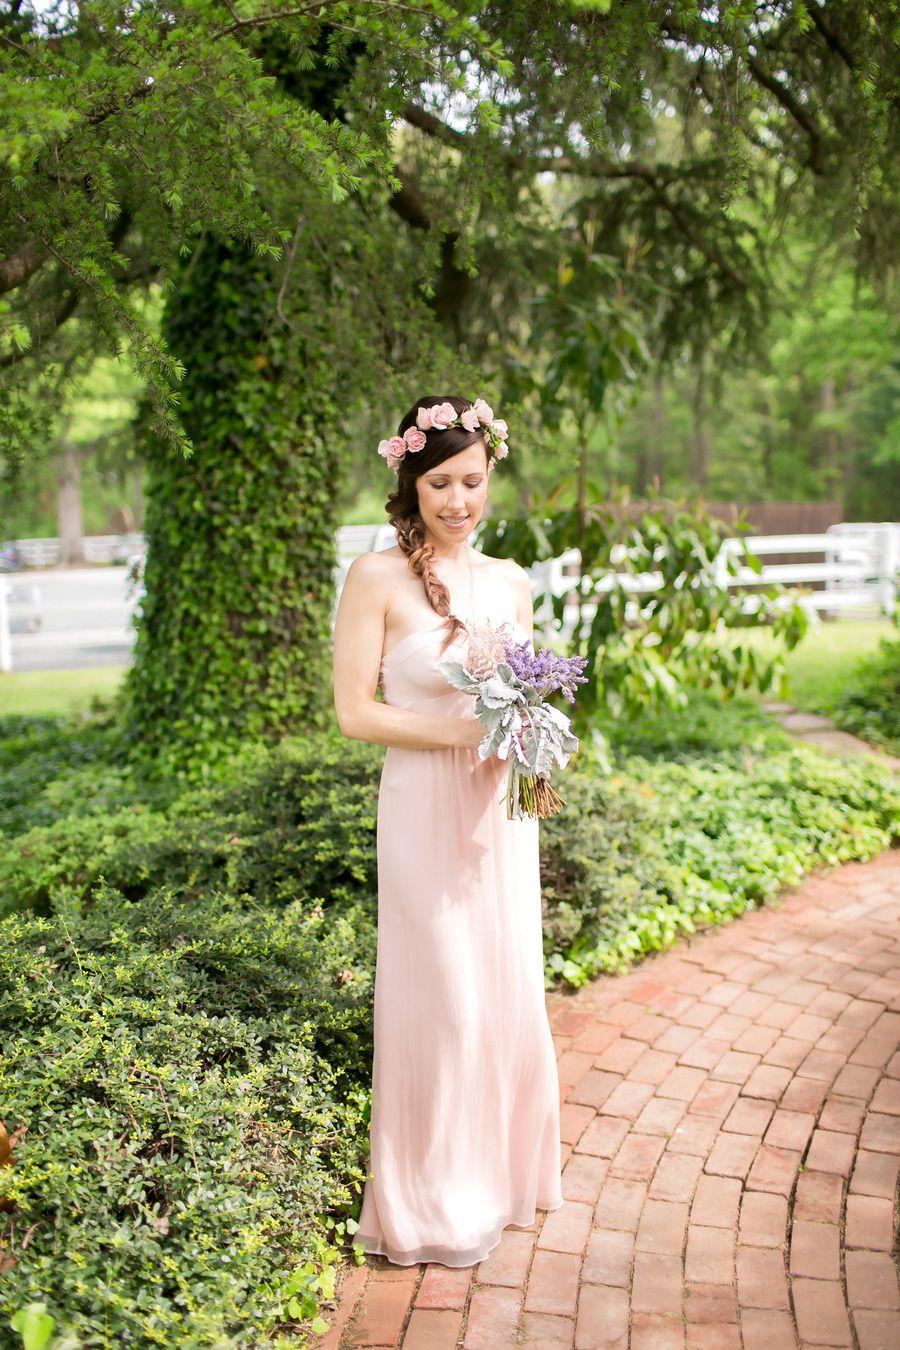 Keswick, Virginia Wedding from Liz Maryann Photography  Read more - http://www.stylemepretty.com/2013/09/26/keswick-virginia-wedding-from-liz-maryann-photography/